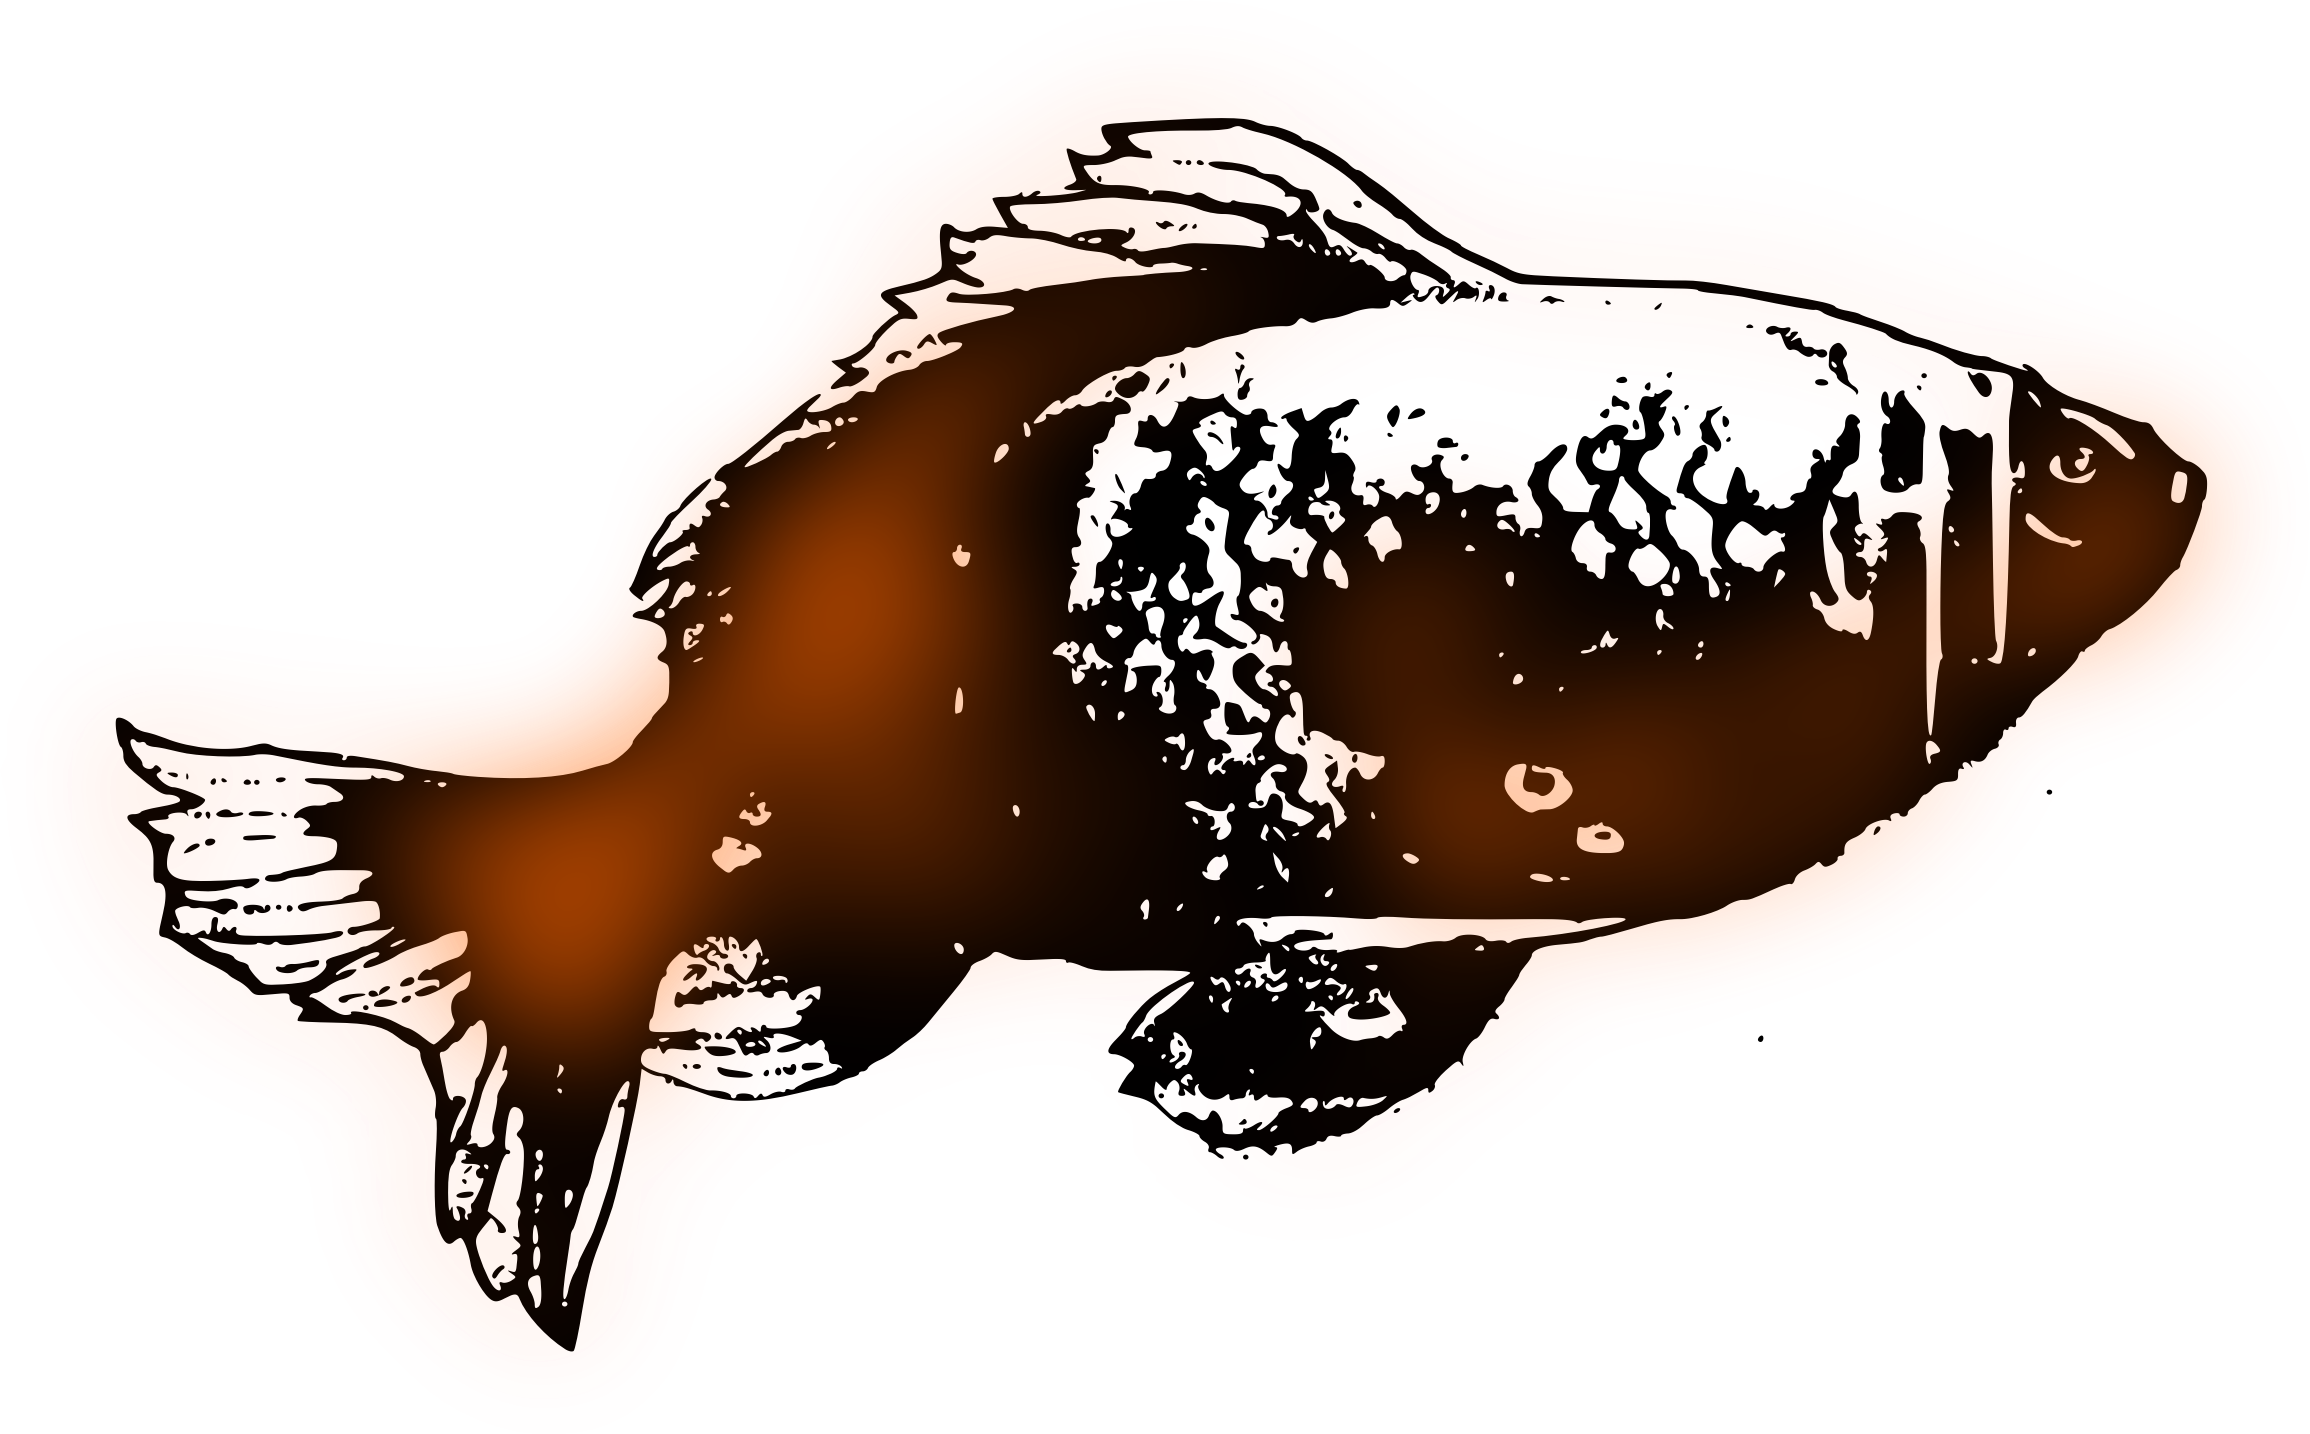 Goldfish Sketch Vector Clipart Image Free Stock Photo Public Domain Photo Cc0 Images